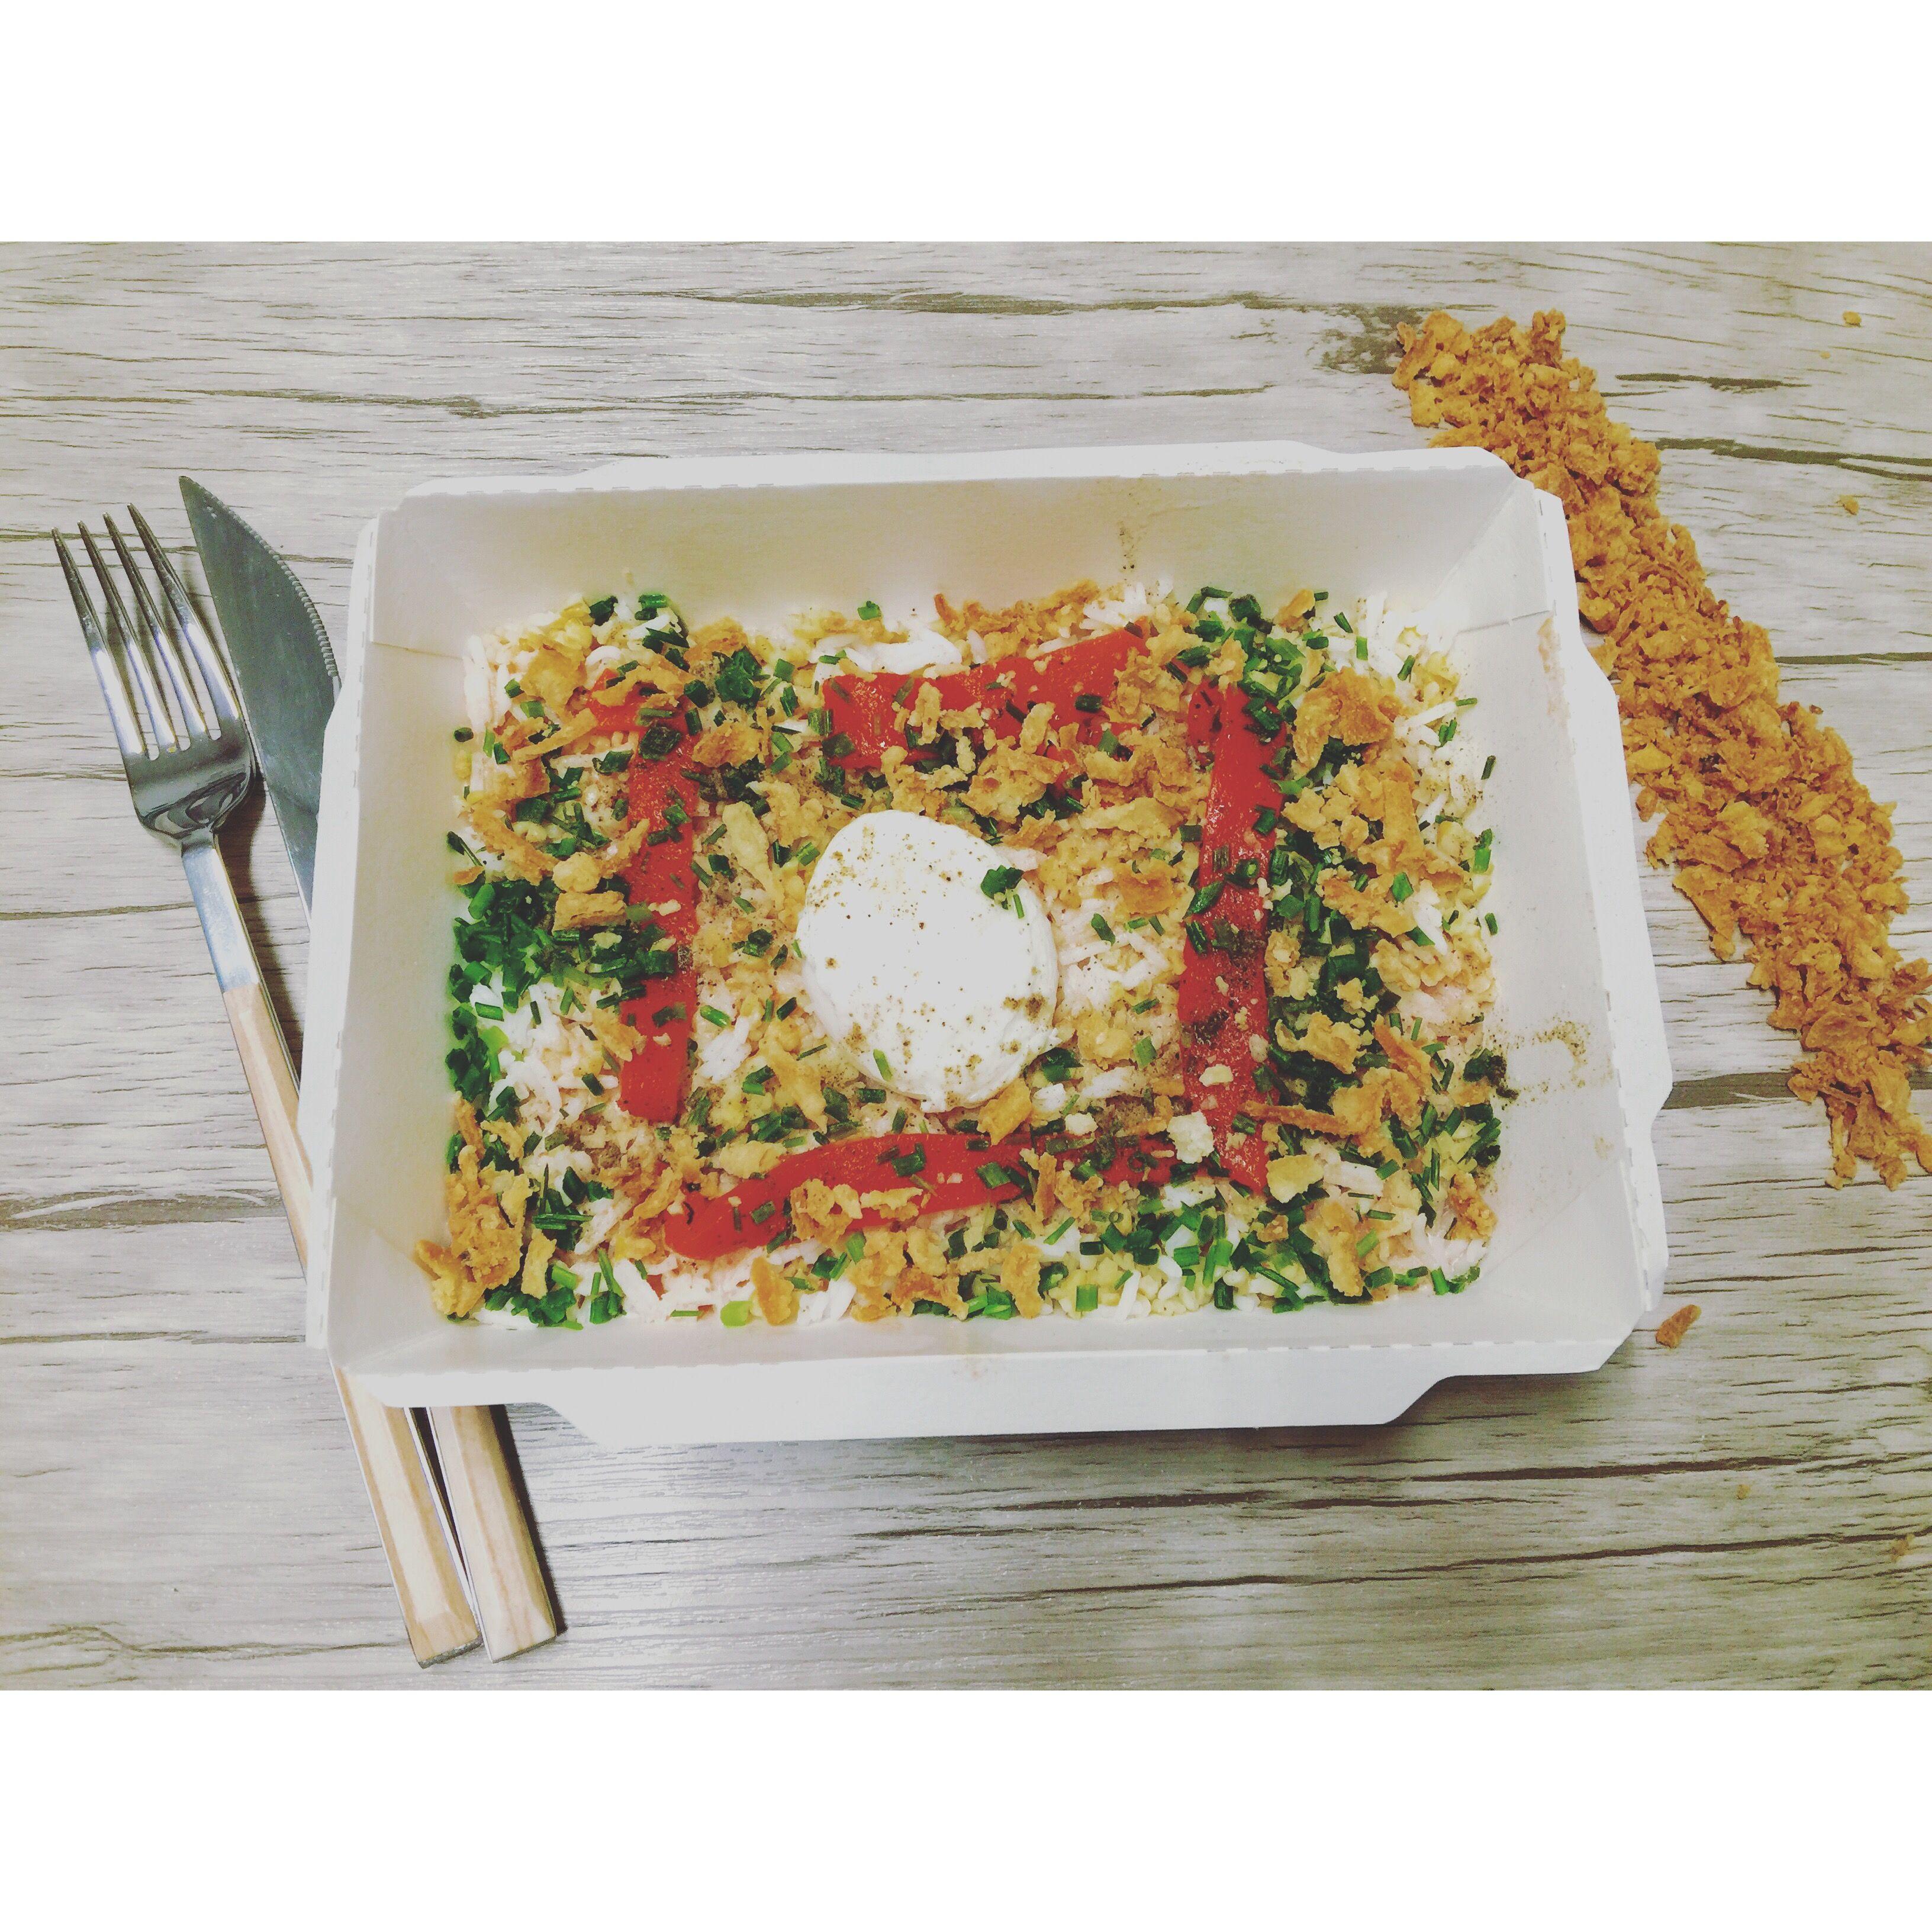 Hot Veggie Salad ! #veggie #vegetarian #quinoa #lentils #hot #hotbox #new #homemade #yummy #delicious #tasty #healthy #healthyfood #eatclean #restaurant #lunch #paris9 #bonneadresse #foodie #food #foodgasm #picoftheday #foodpics #lmp #lamaisondesproteines #happy #superfood #nutrition #regime